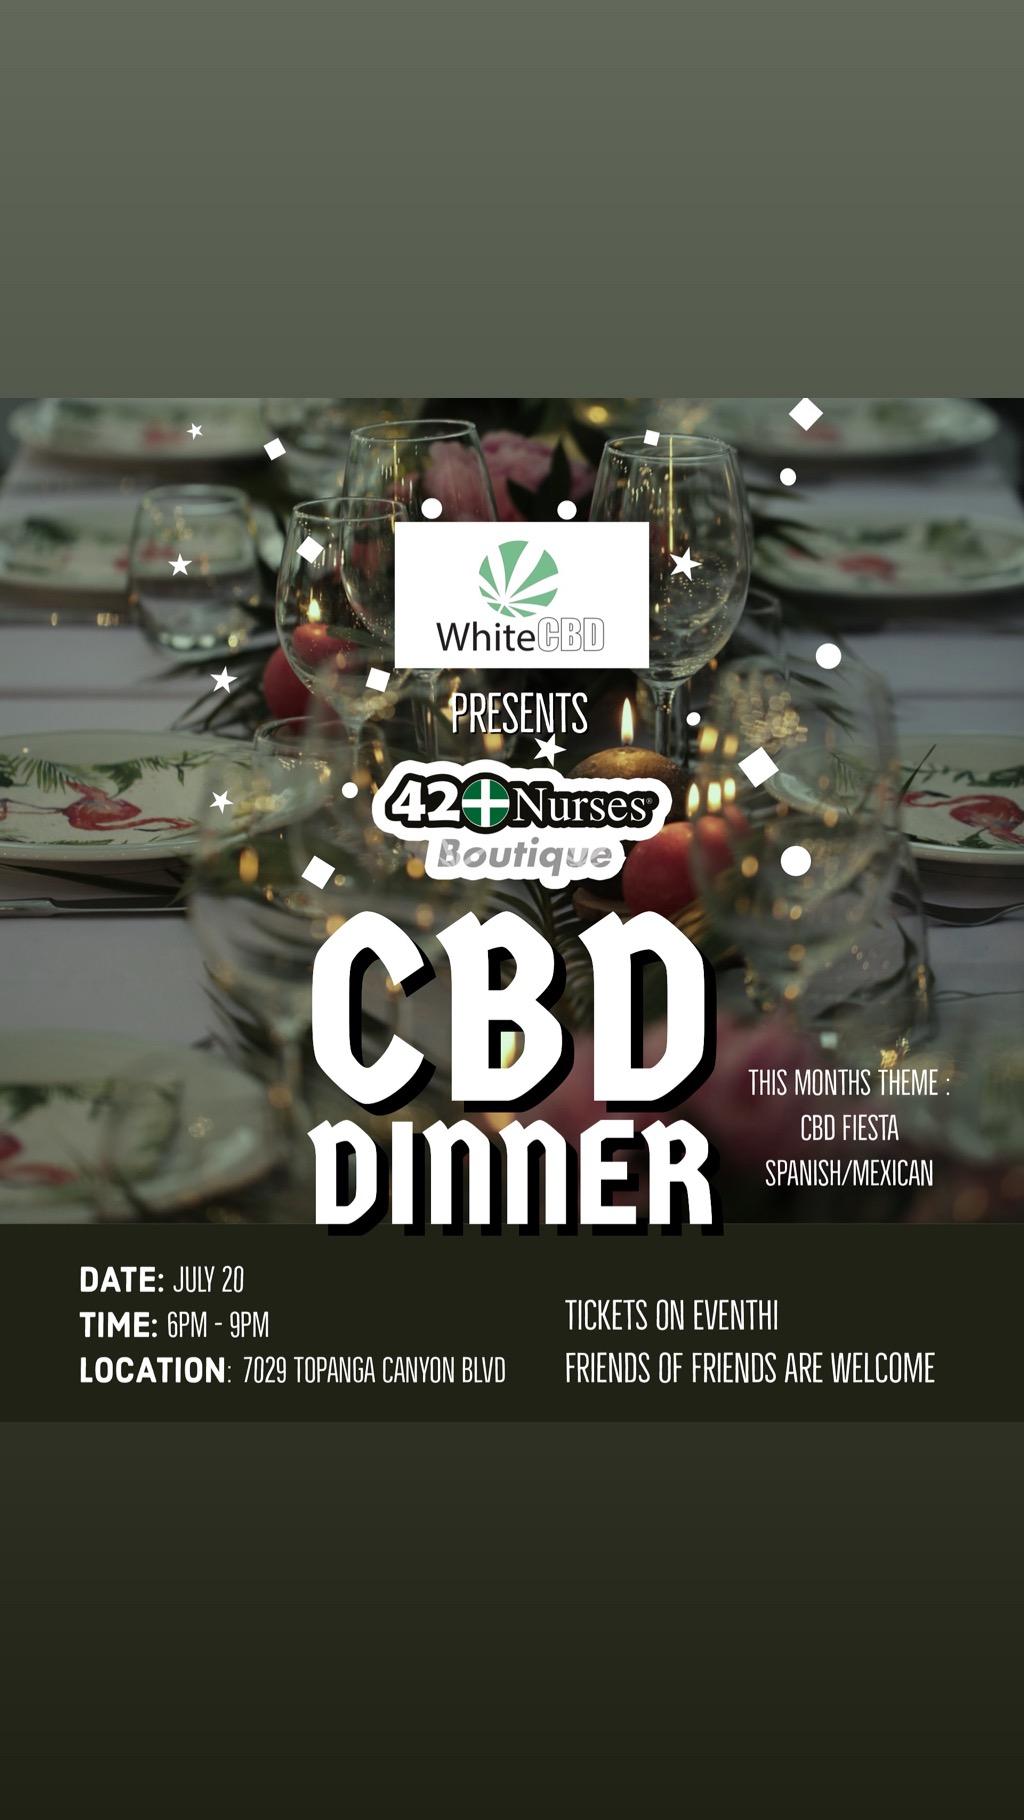 CBD DINNER